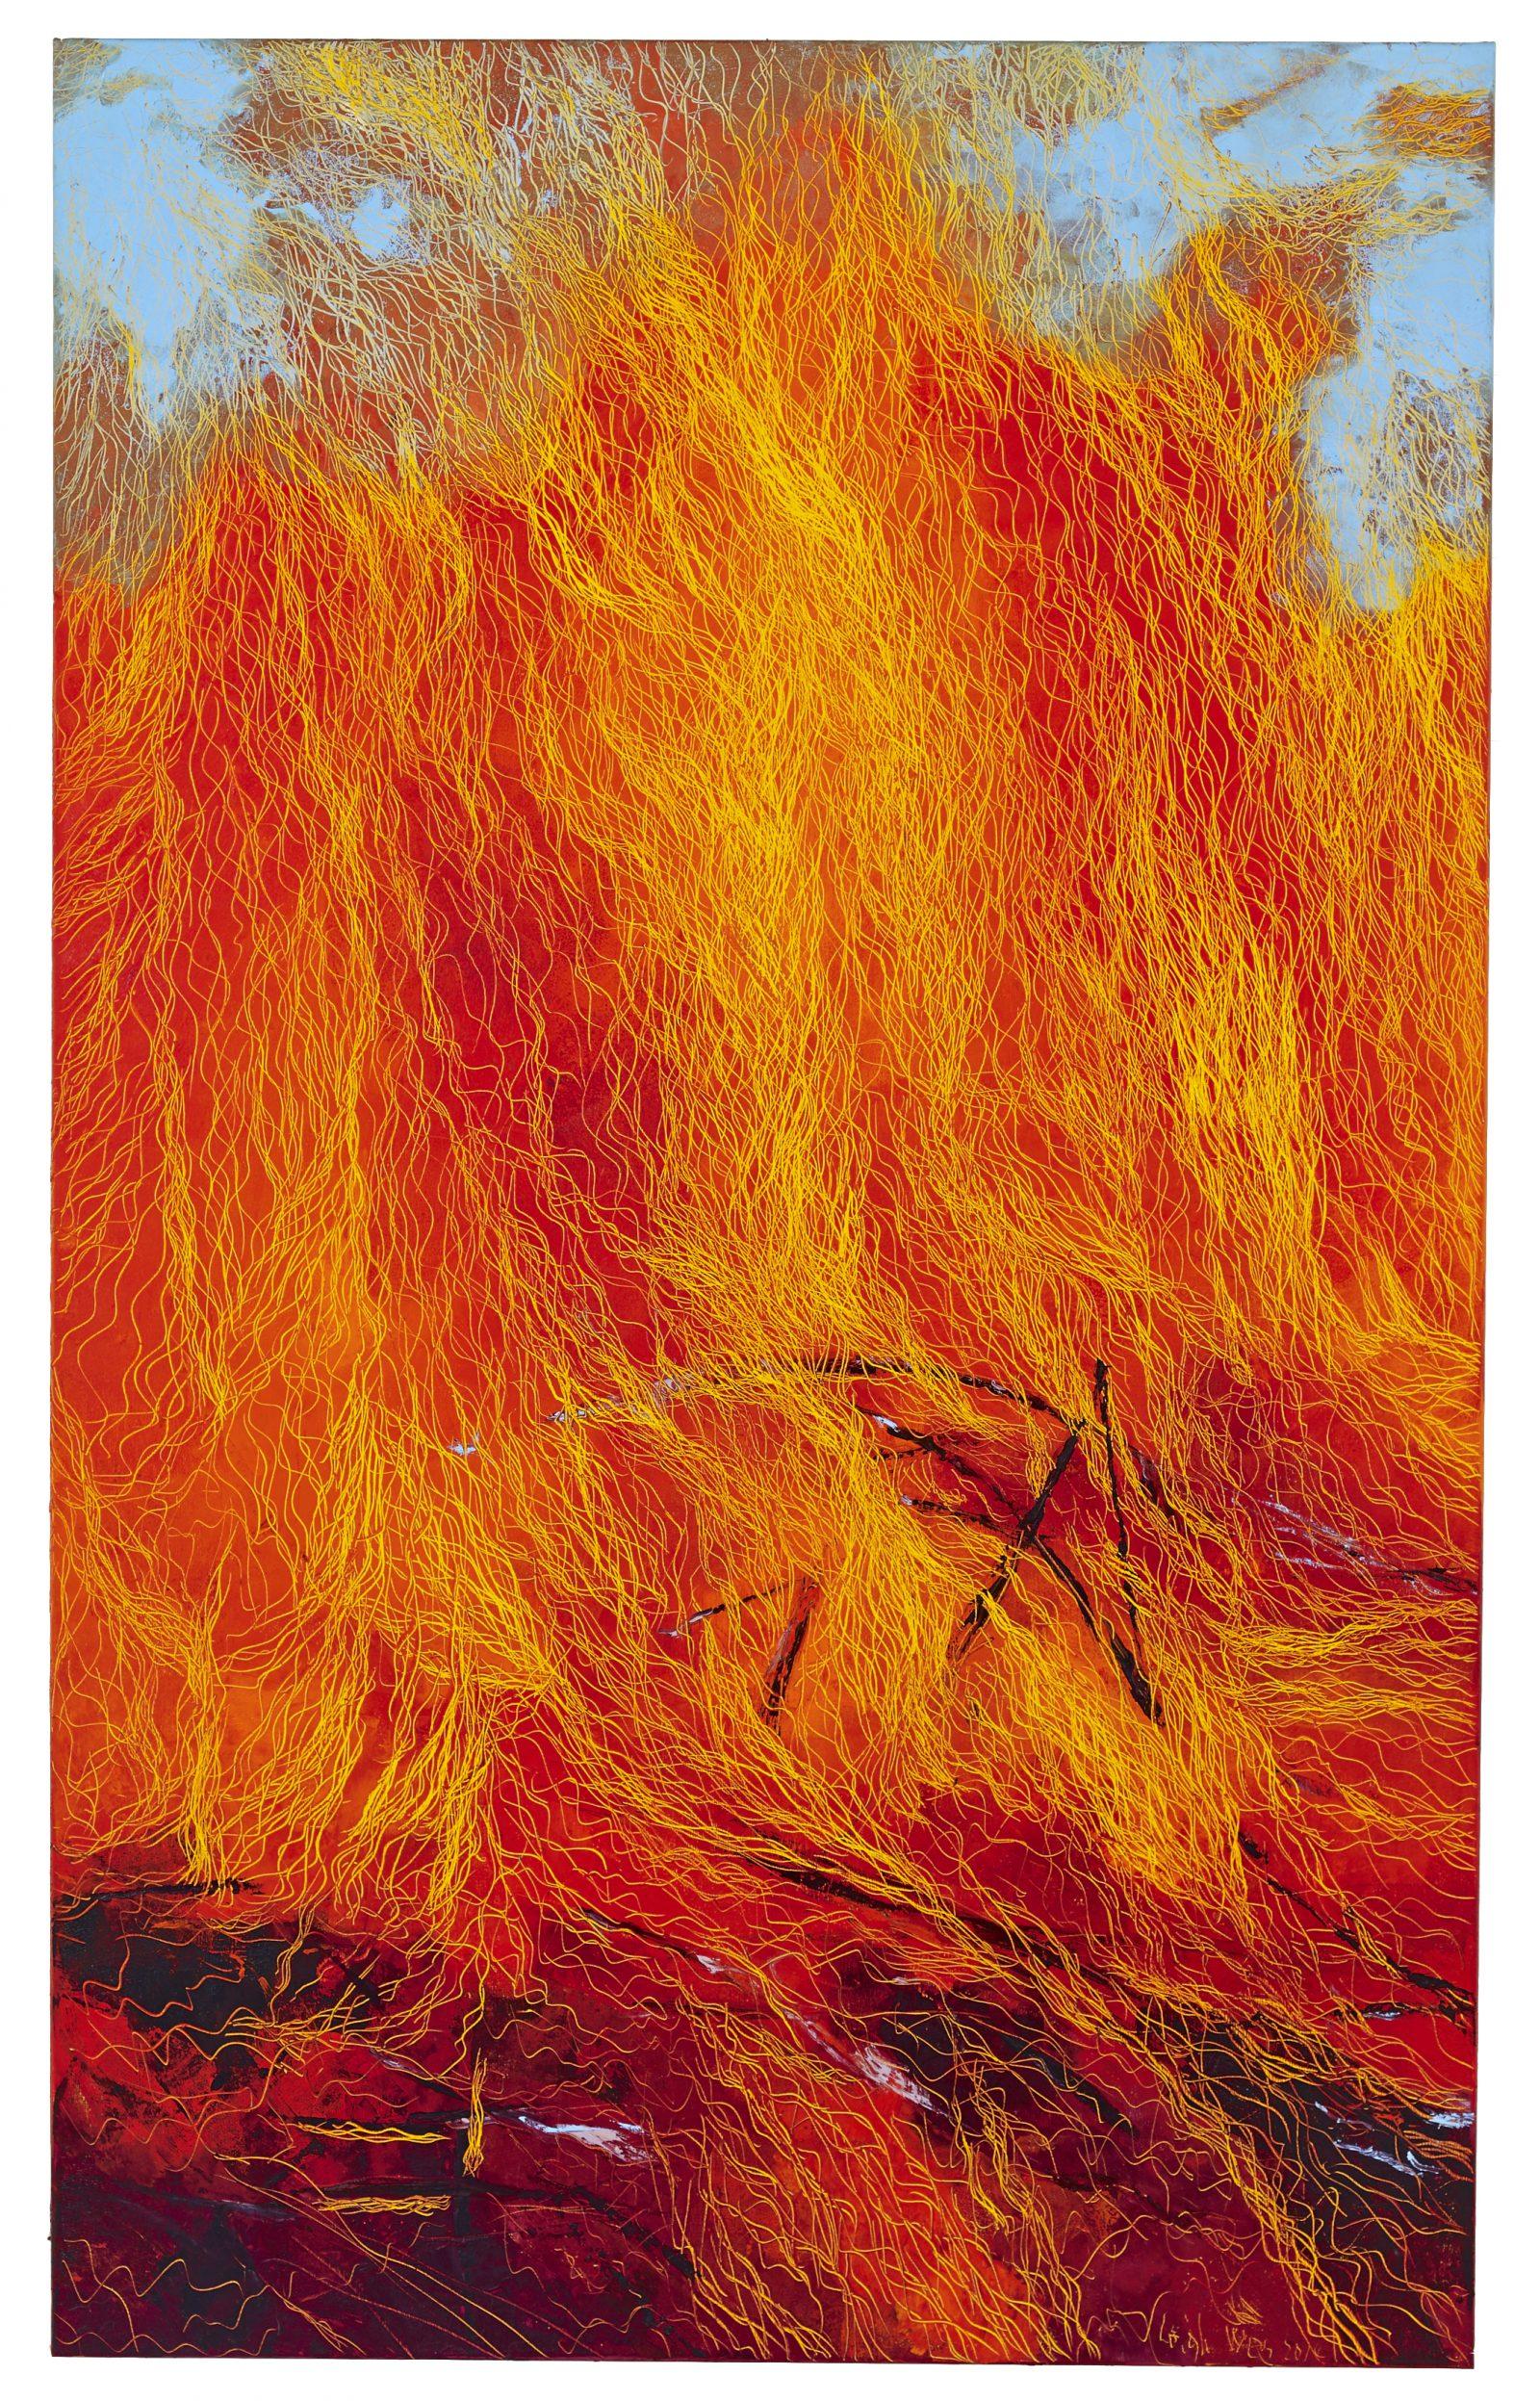 燦, Splendid, 30 x 80 cm, oil on canvas, 2014